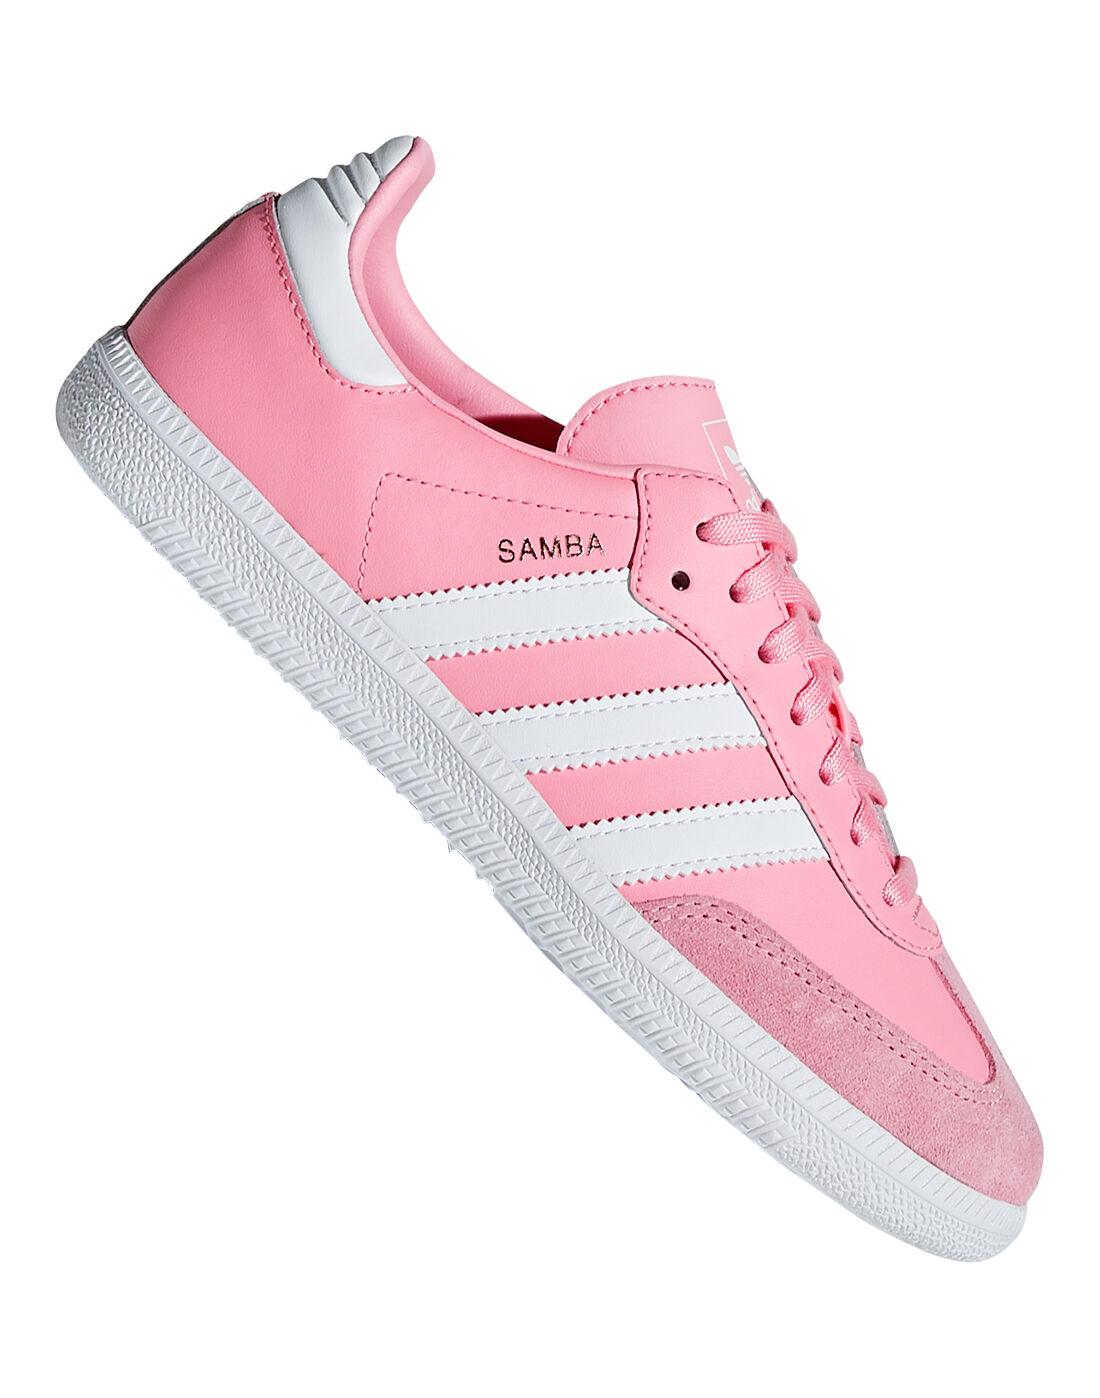 Girl's Pink adidas Originals Samba OG